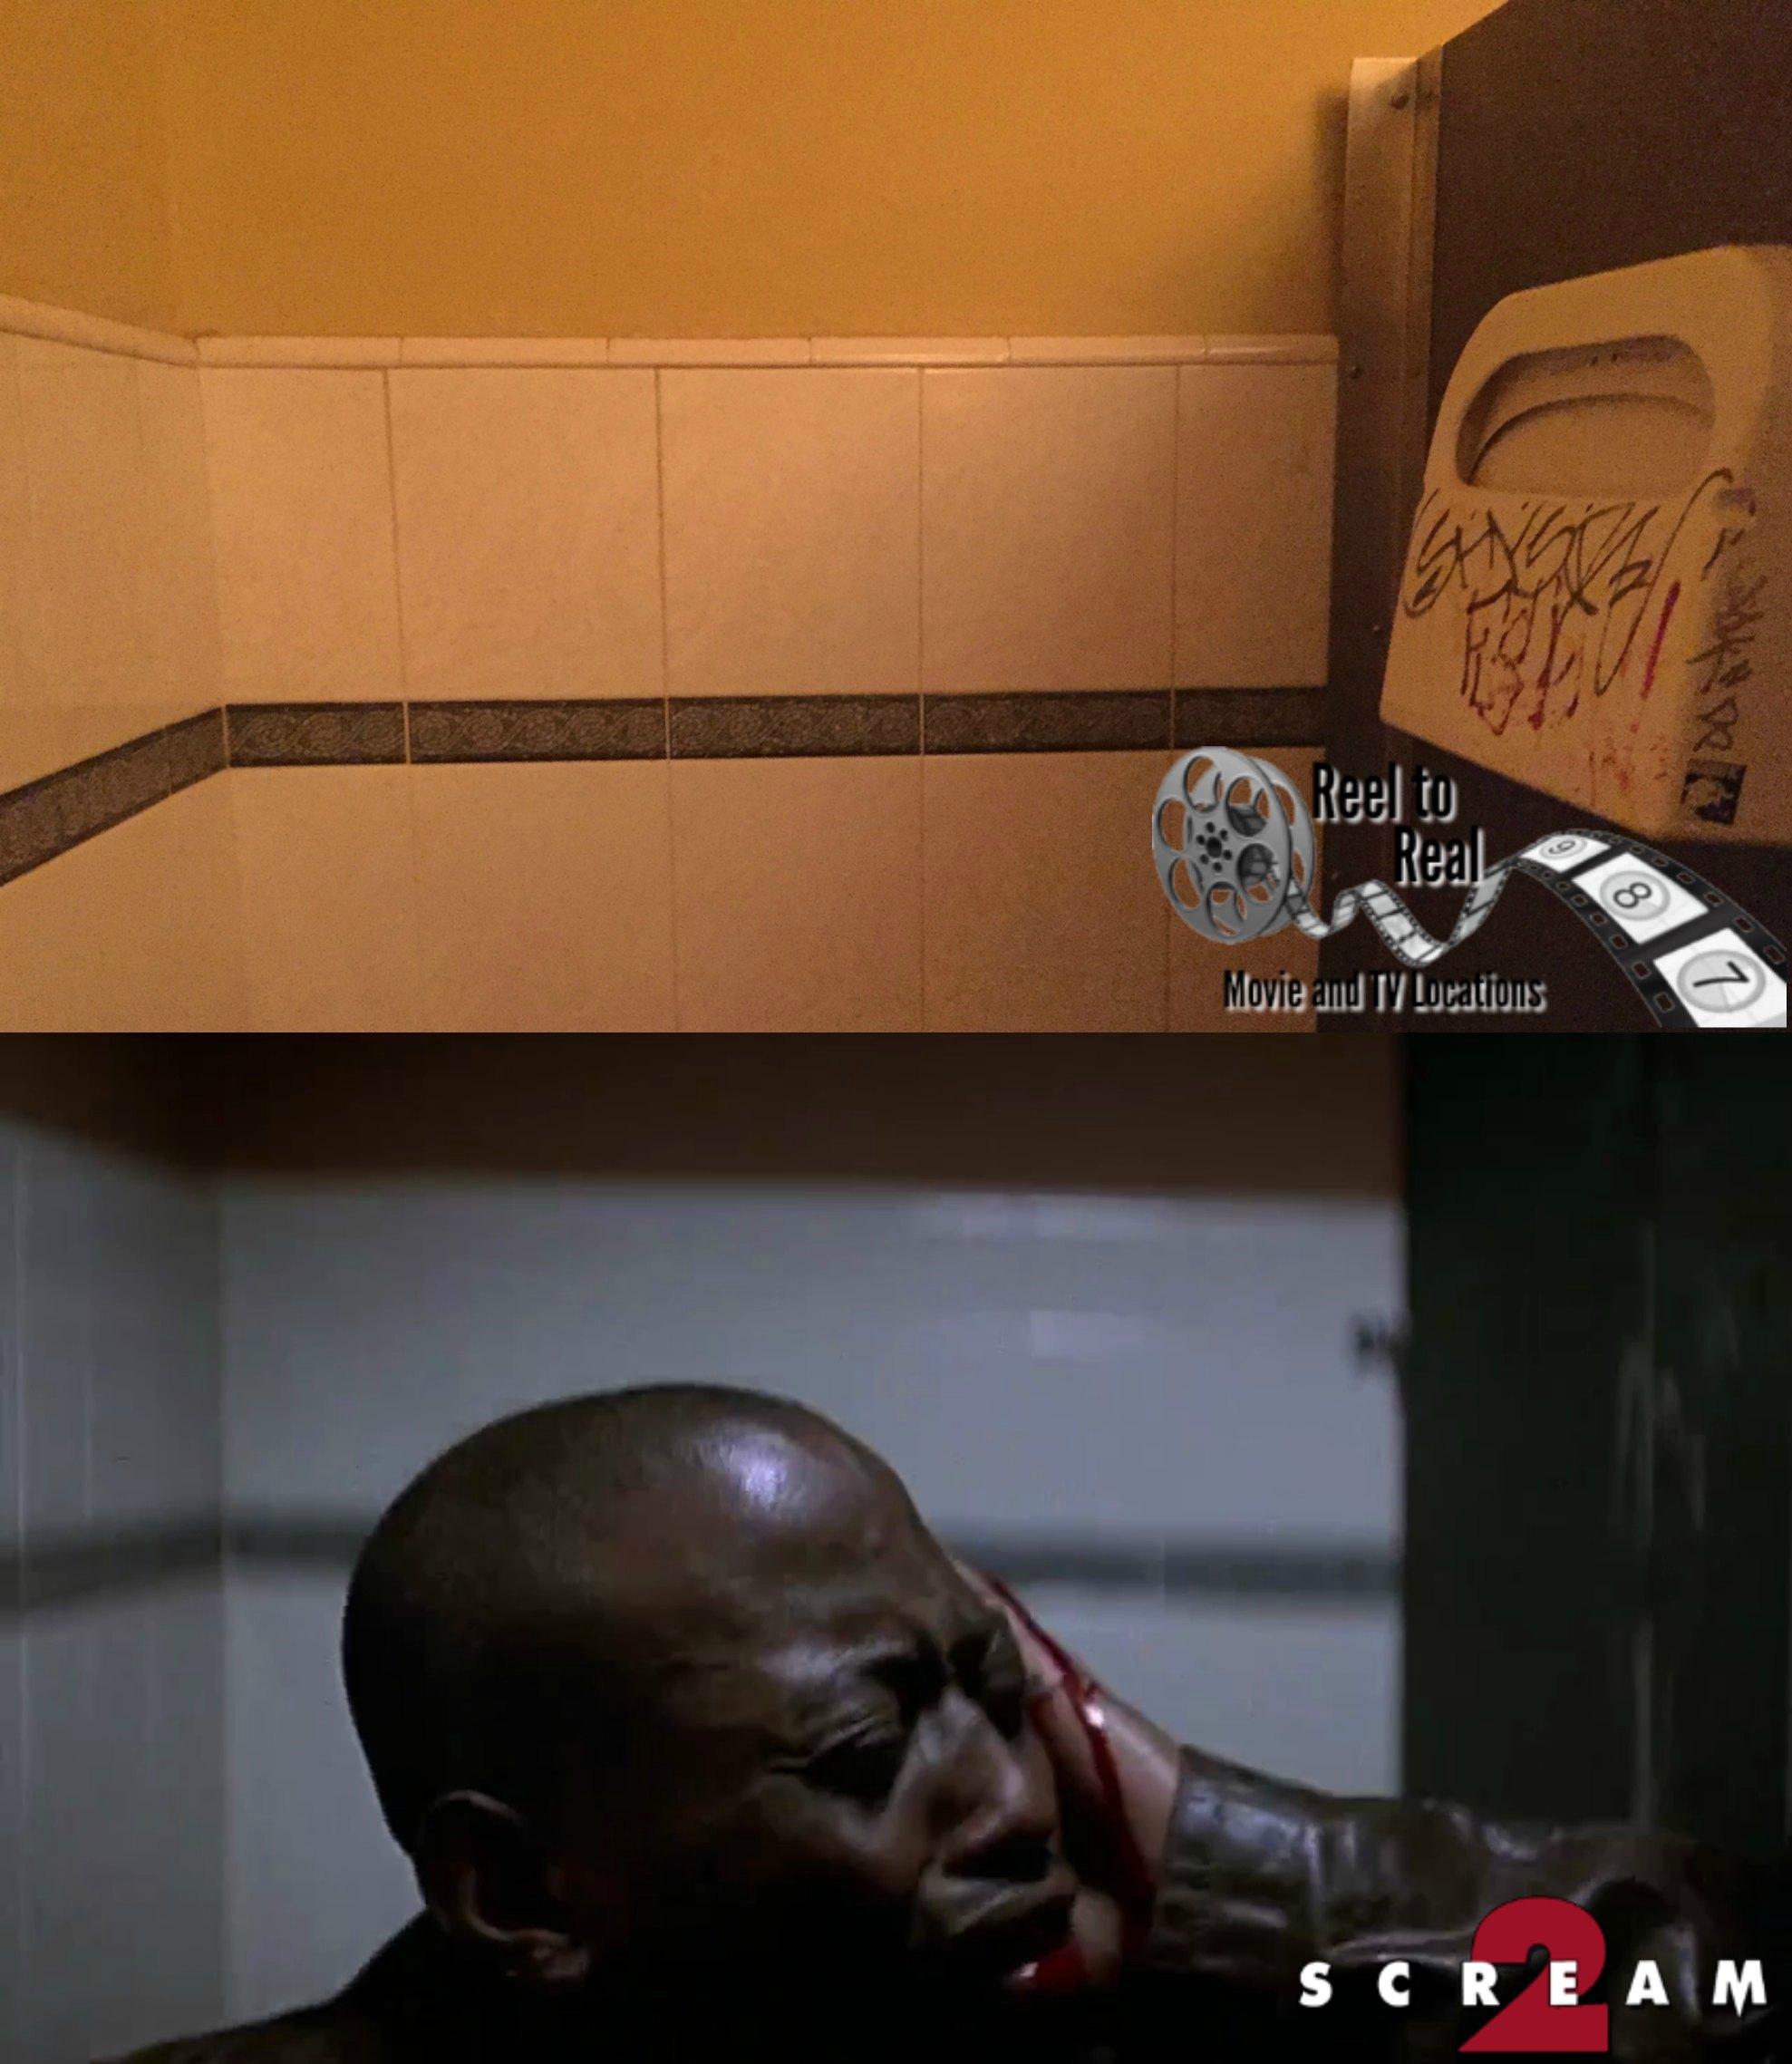 Scream 2 comparison B 19.jpg